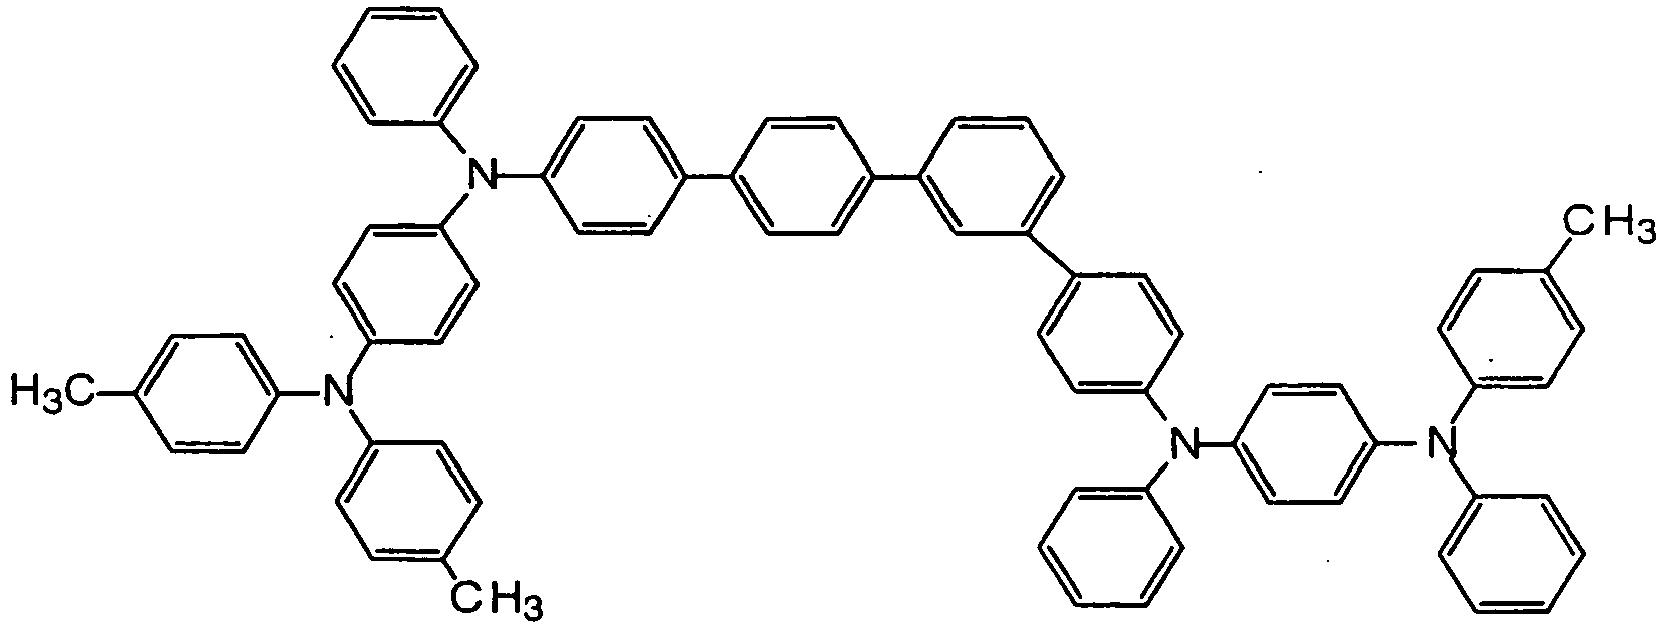 Figure imgb0929